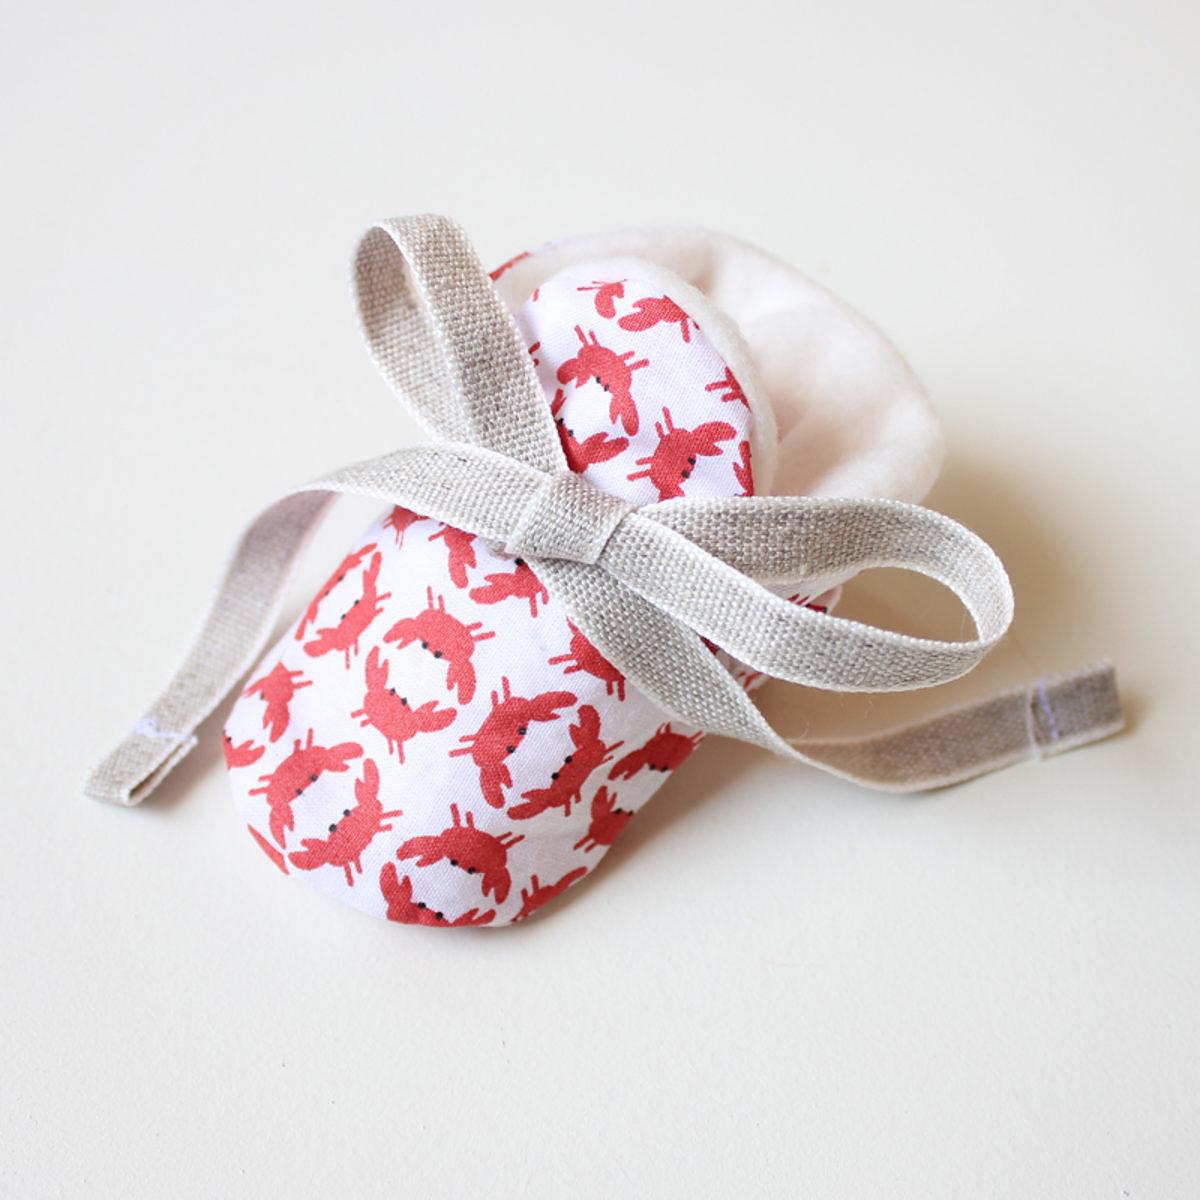 La couture selon pauline tuto chaussons b b saxe - Tuto chausson bebe couture ...